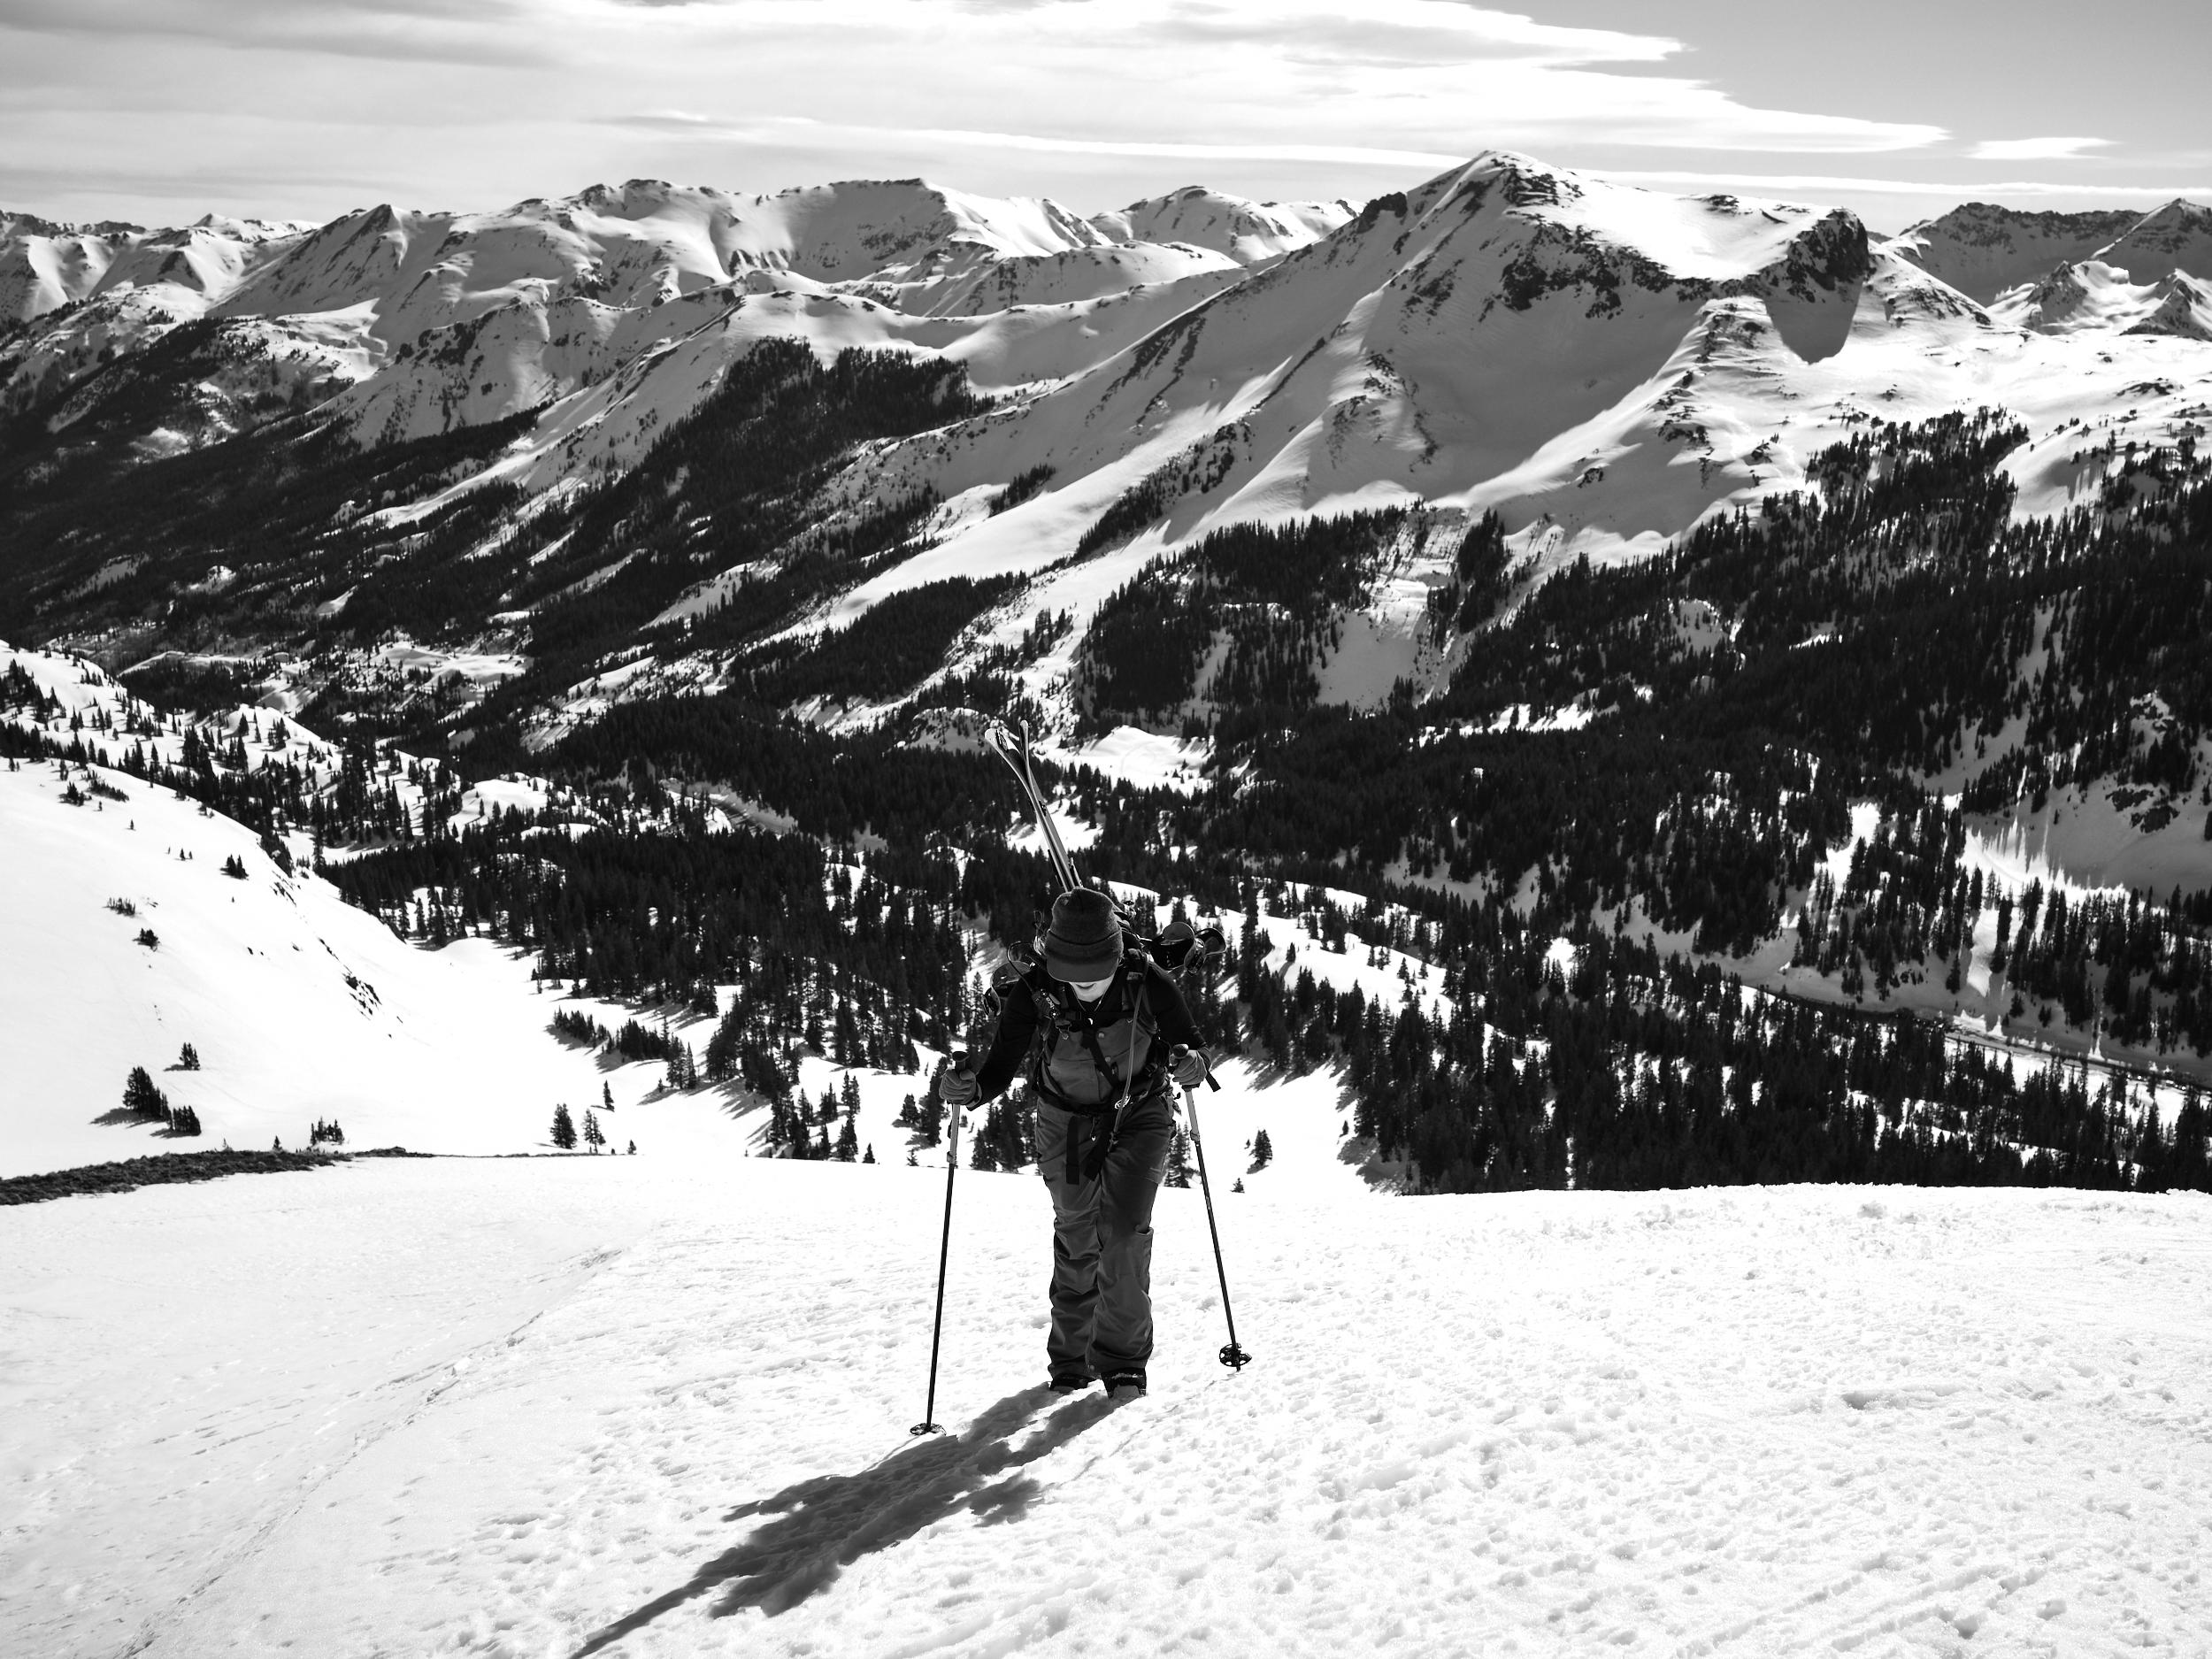 KK_Backountry Snowboarding_San Juans17.jpg